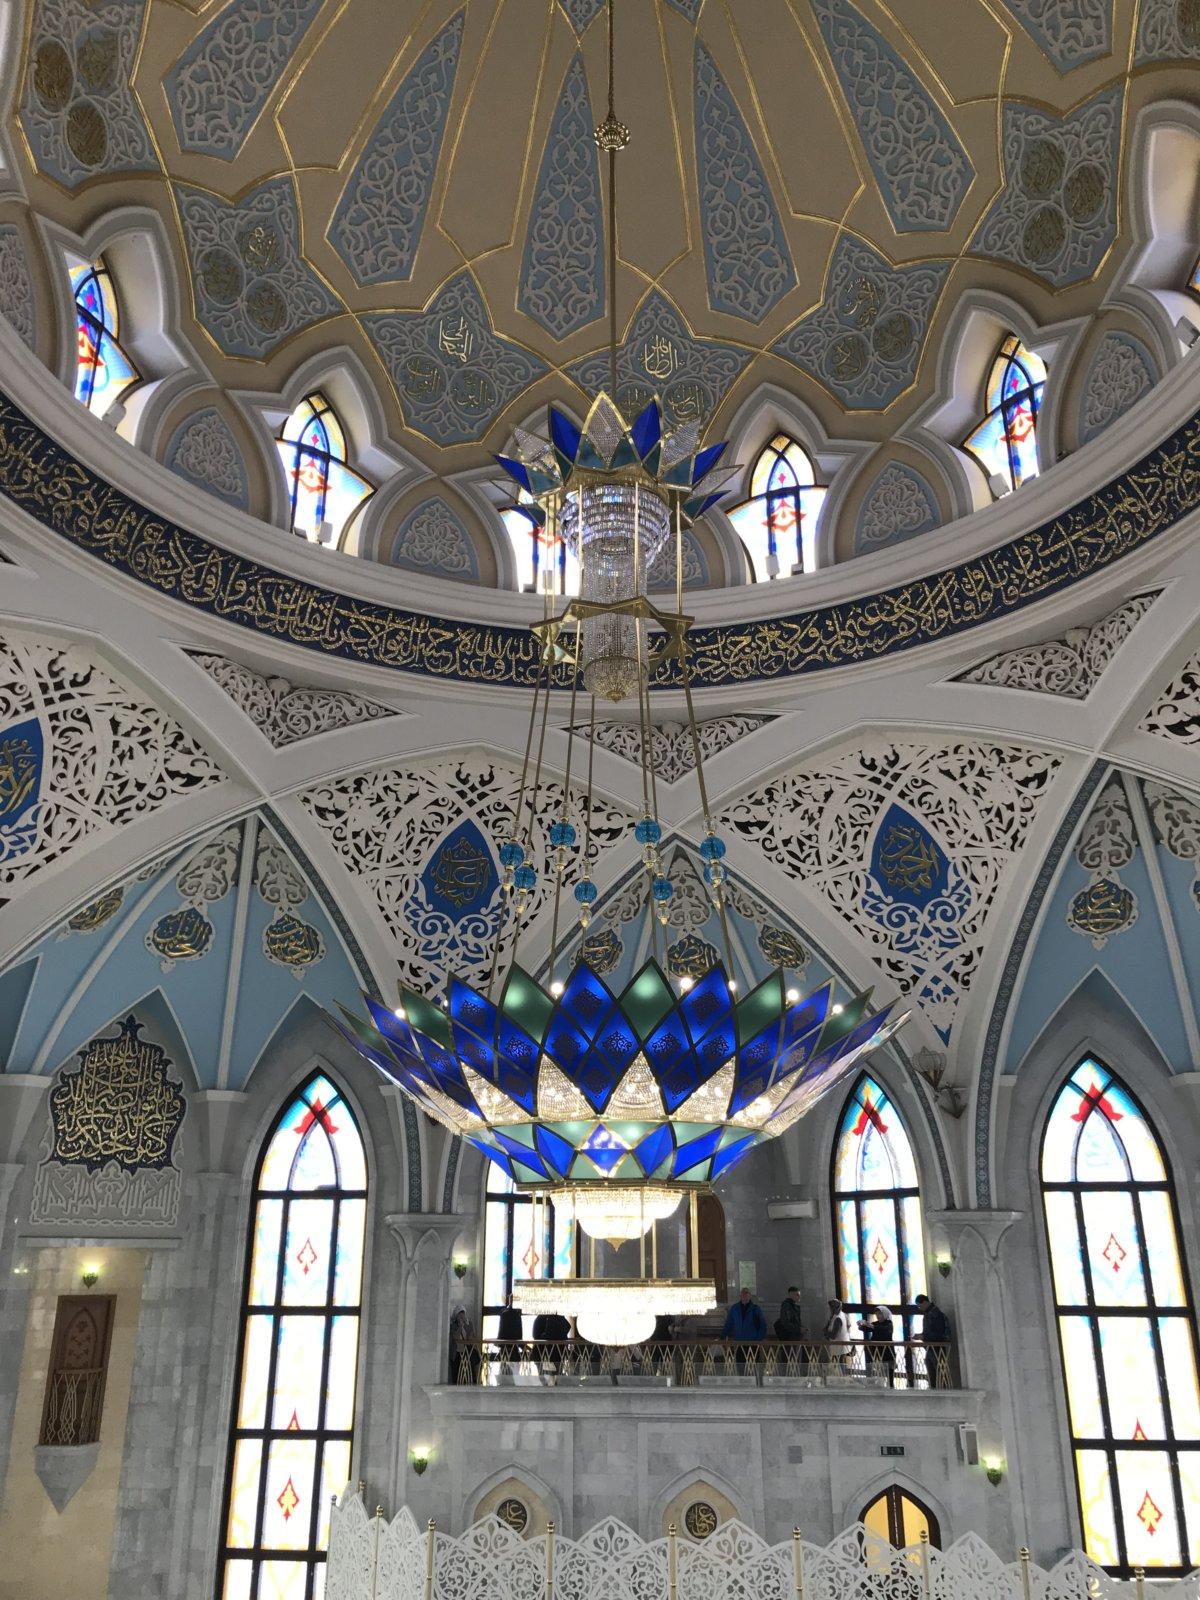 08-27 Mosque 04